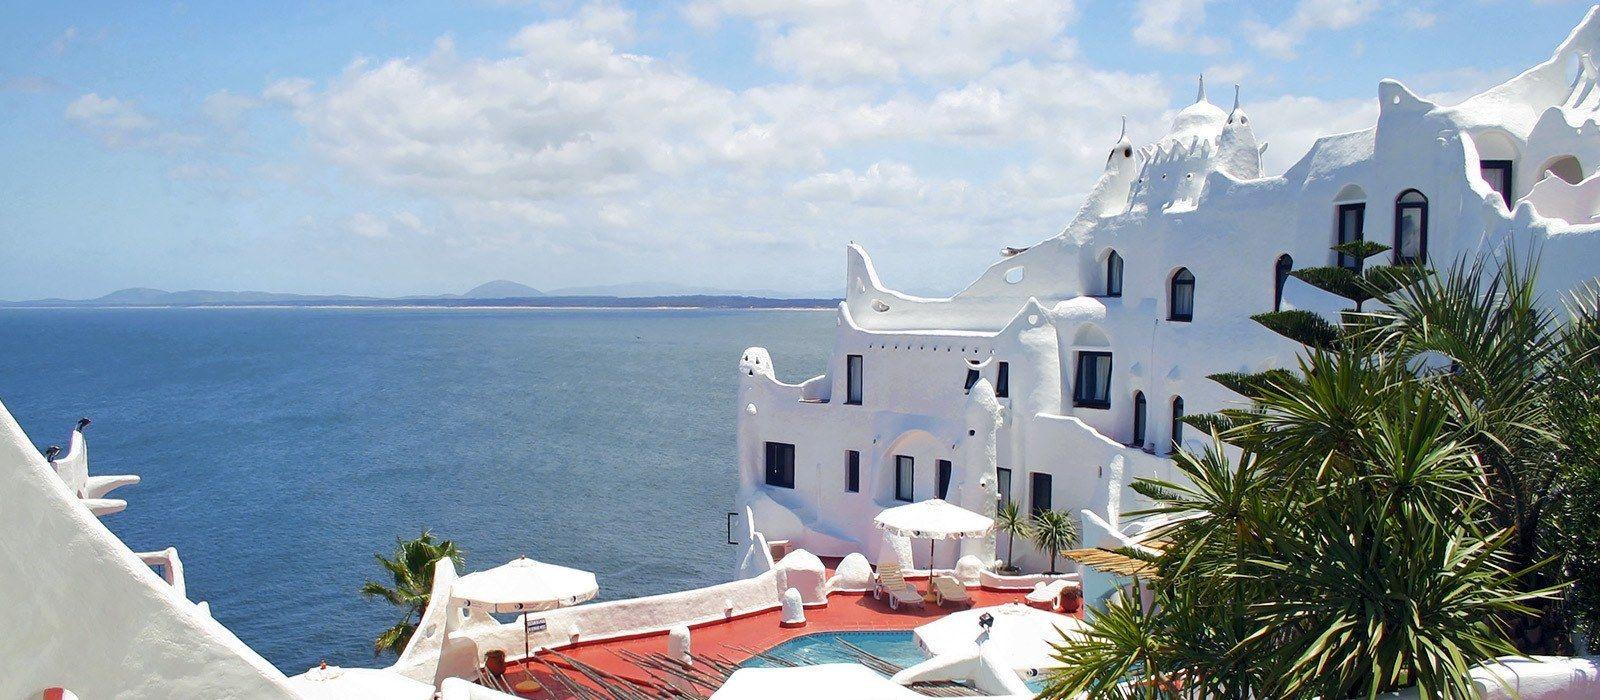 Reiseziel Punta del Este Uruguay